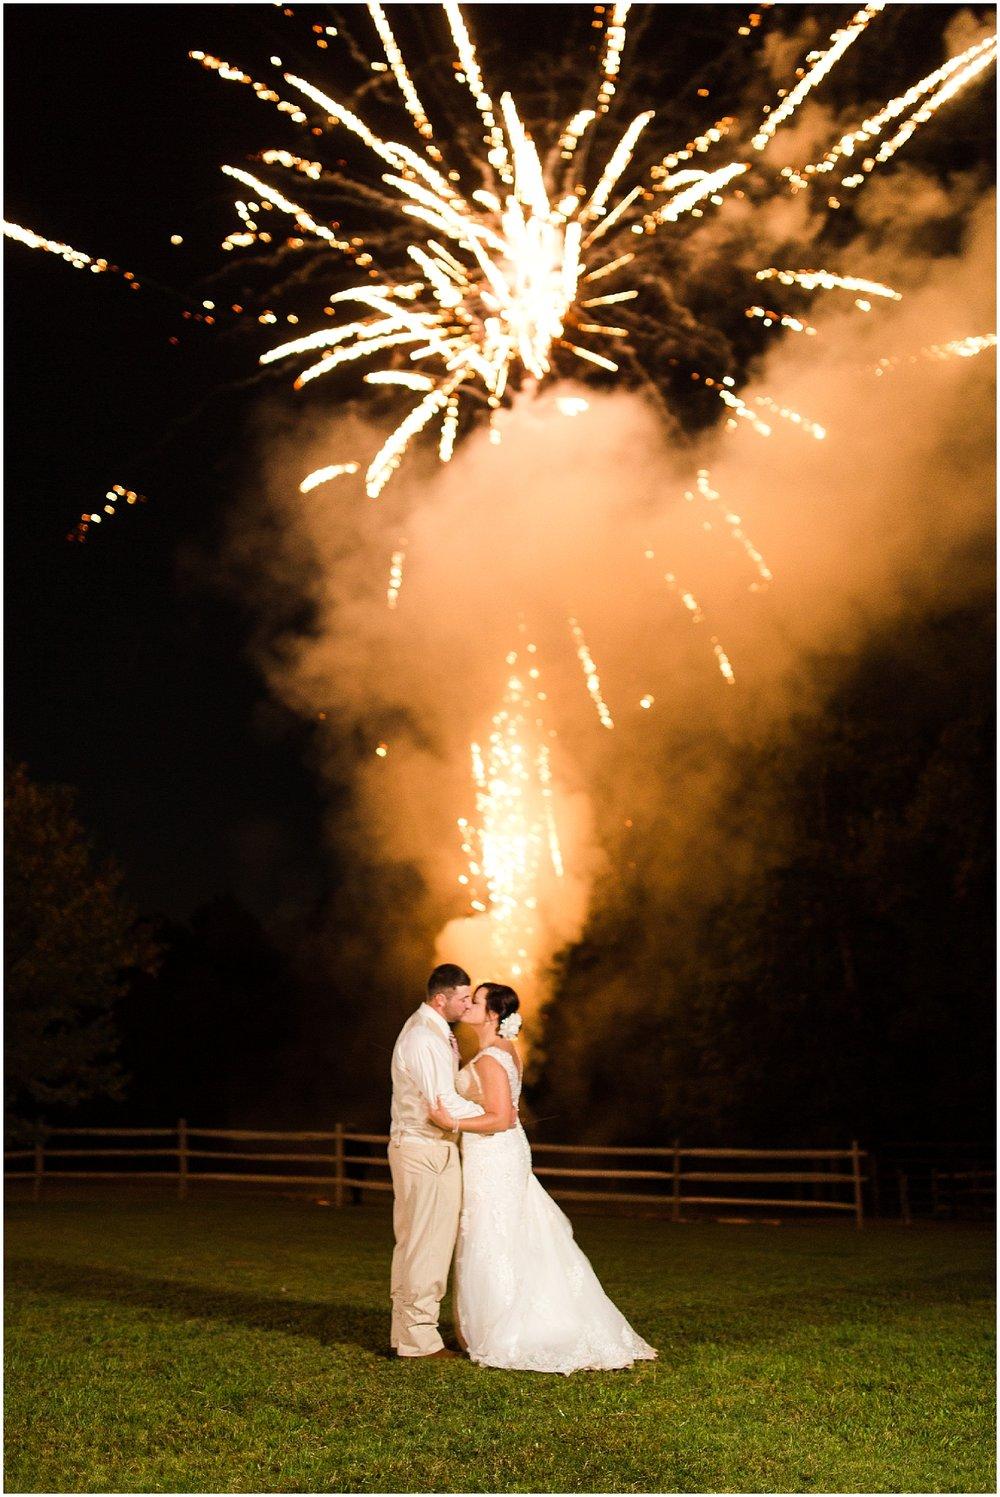 Rustic Country Wedding Virginia Photographer (68).jpg